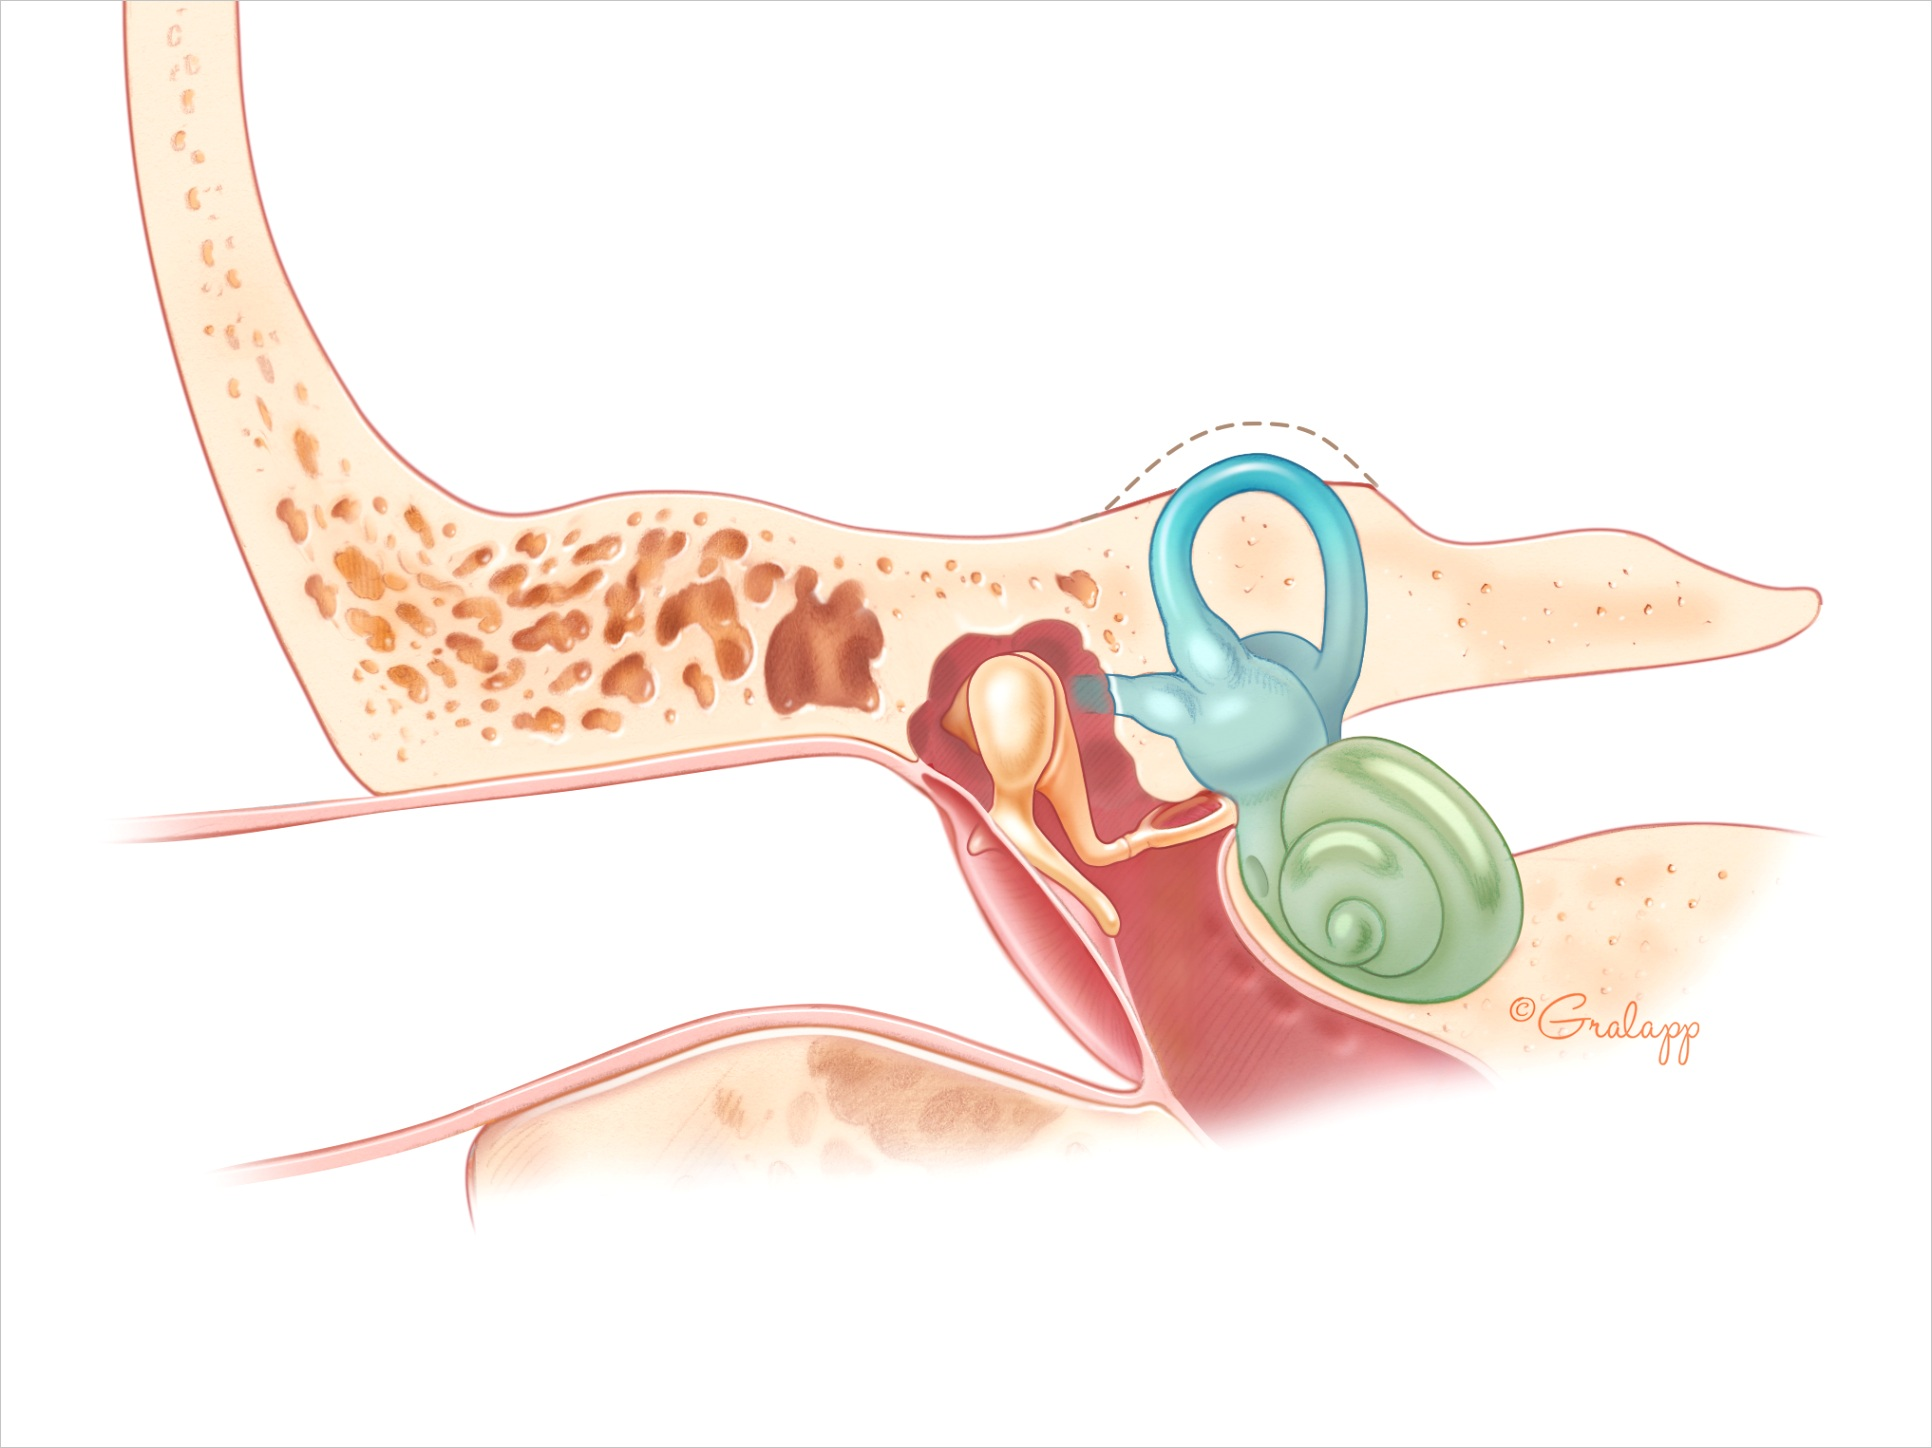 superior semicircular canal dehiscence